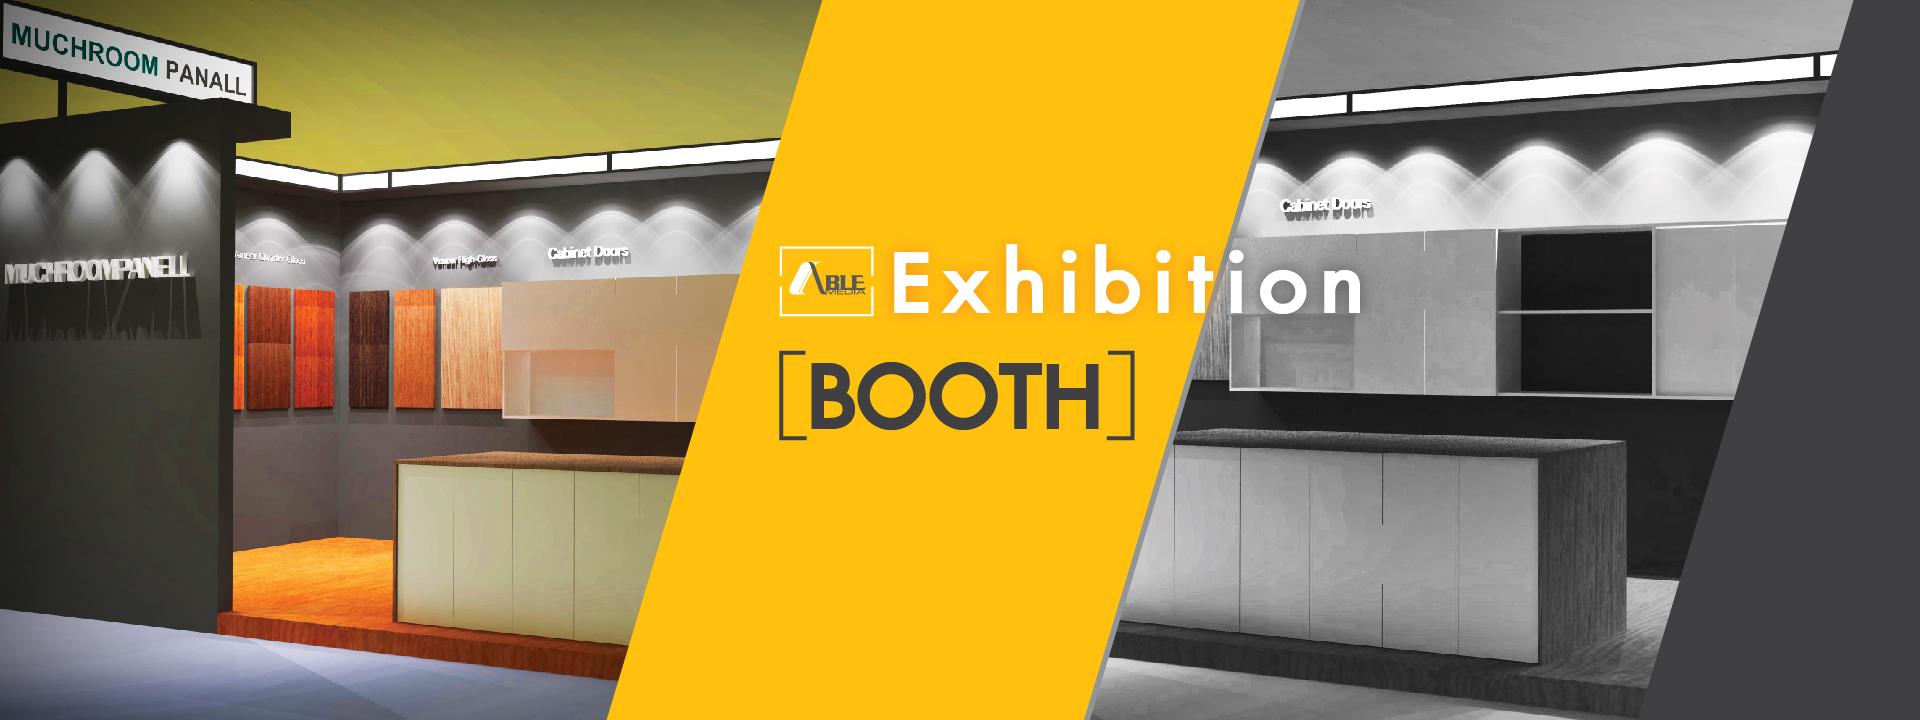 Exhibition Booth - ออกแบบบูธจัดแสดง